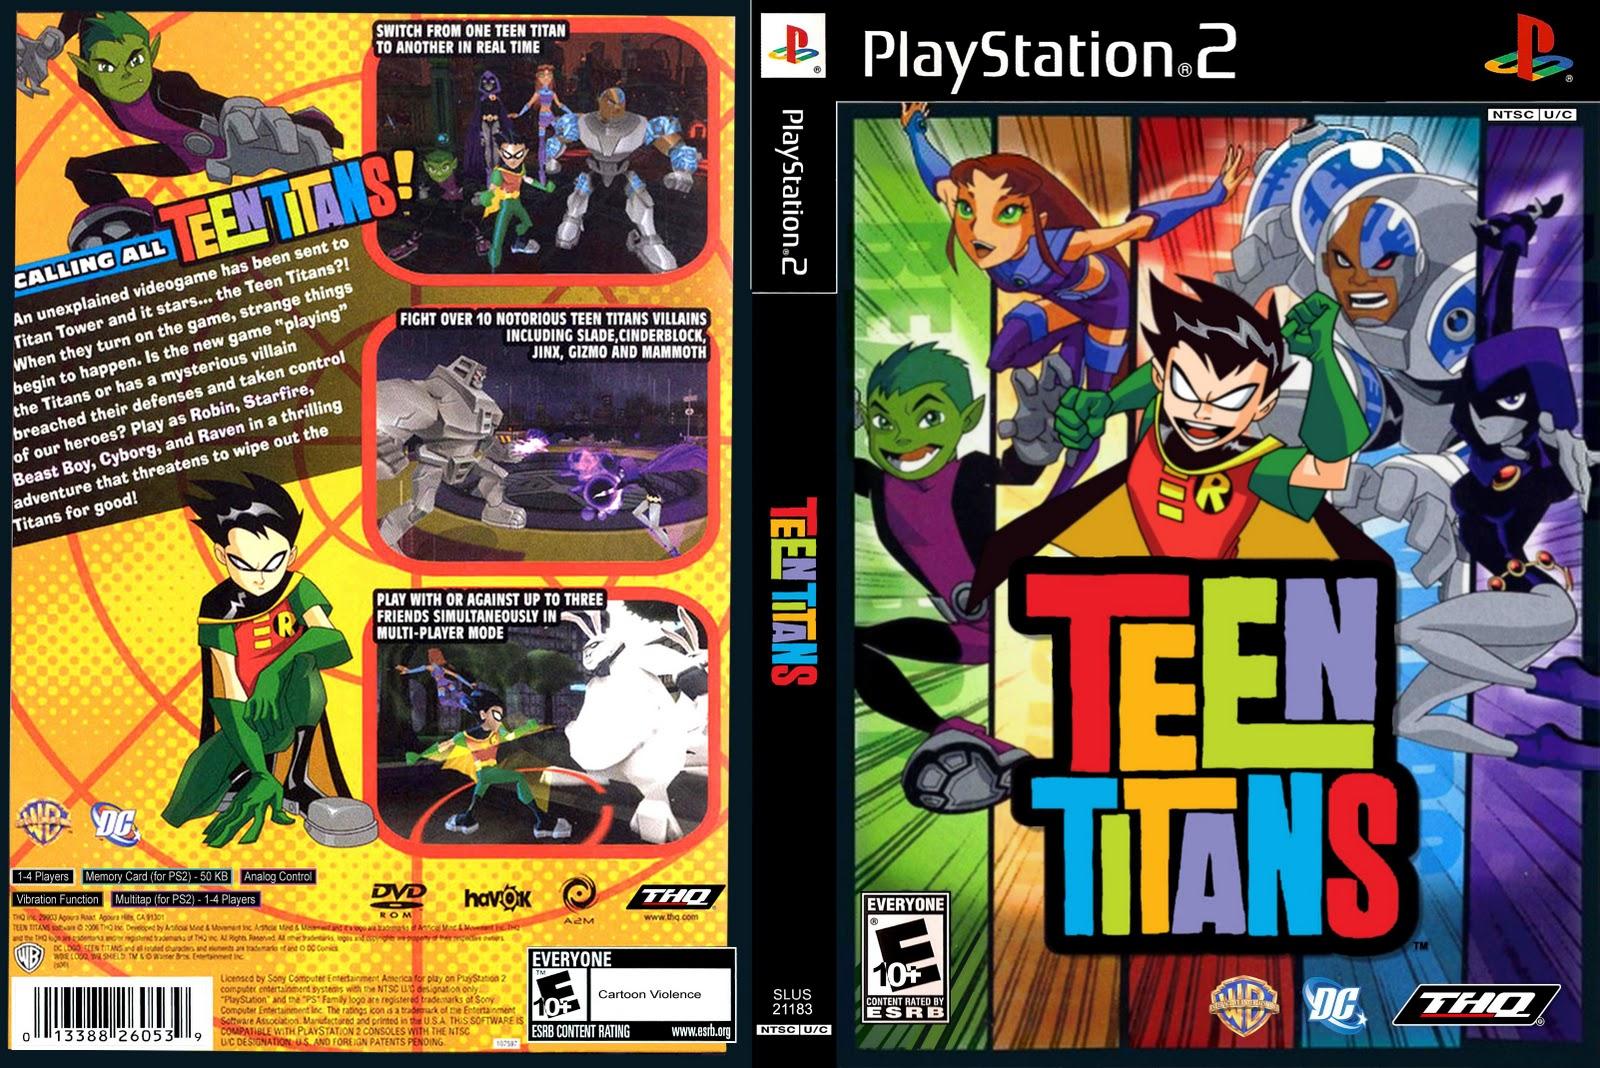 Teen Titan Megaupload 68